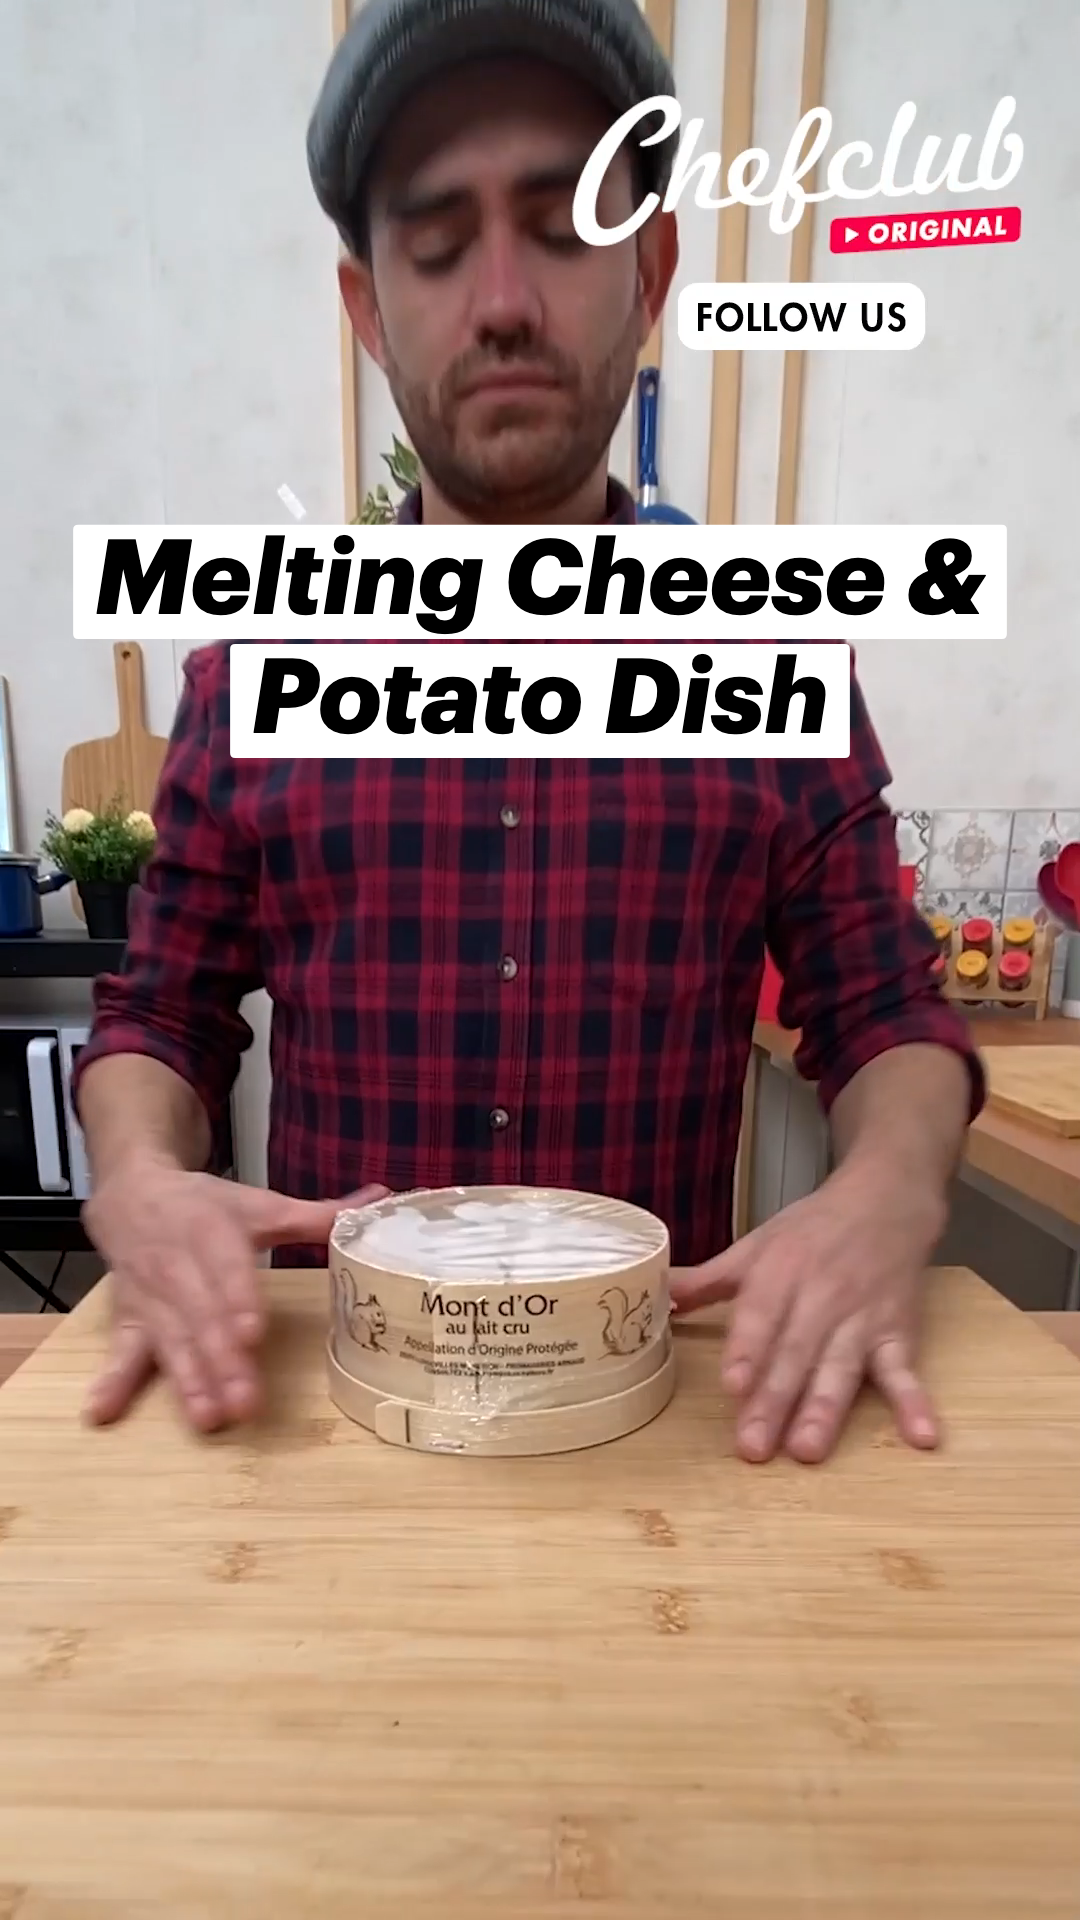 Melting Cheese & Potato Dish